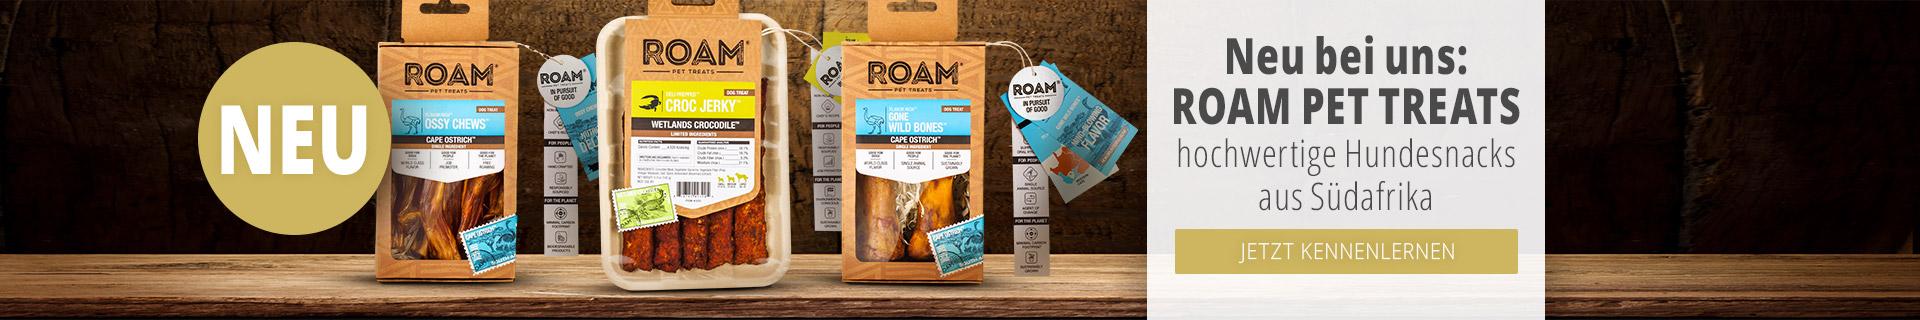 Roam Pet Treats Neuheit